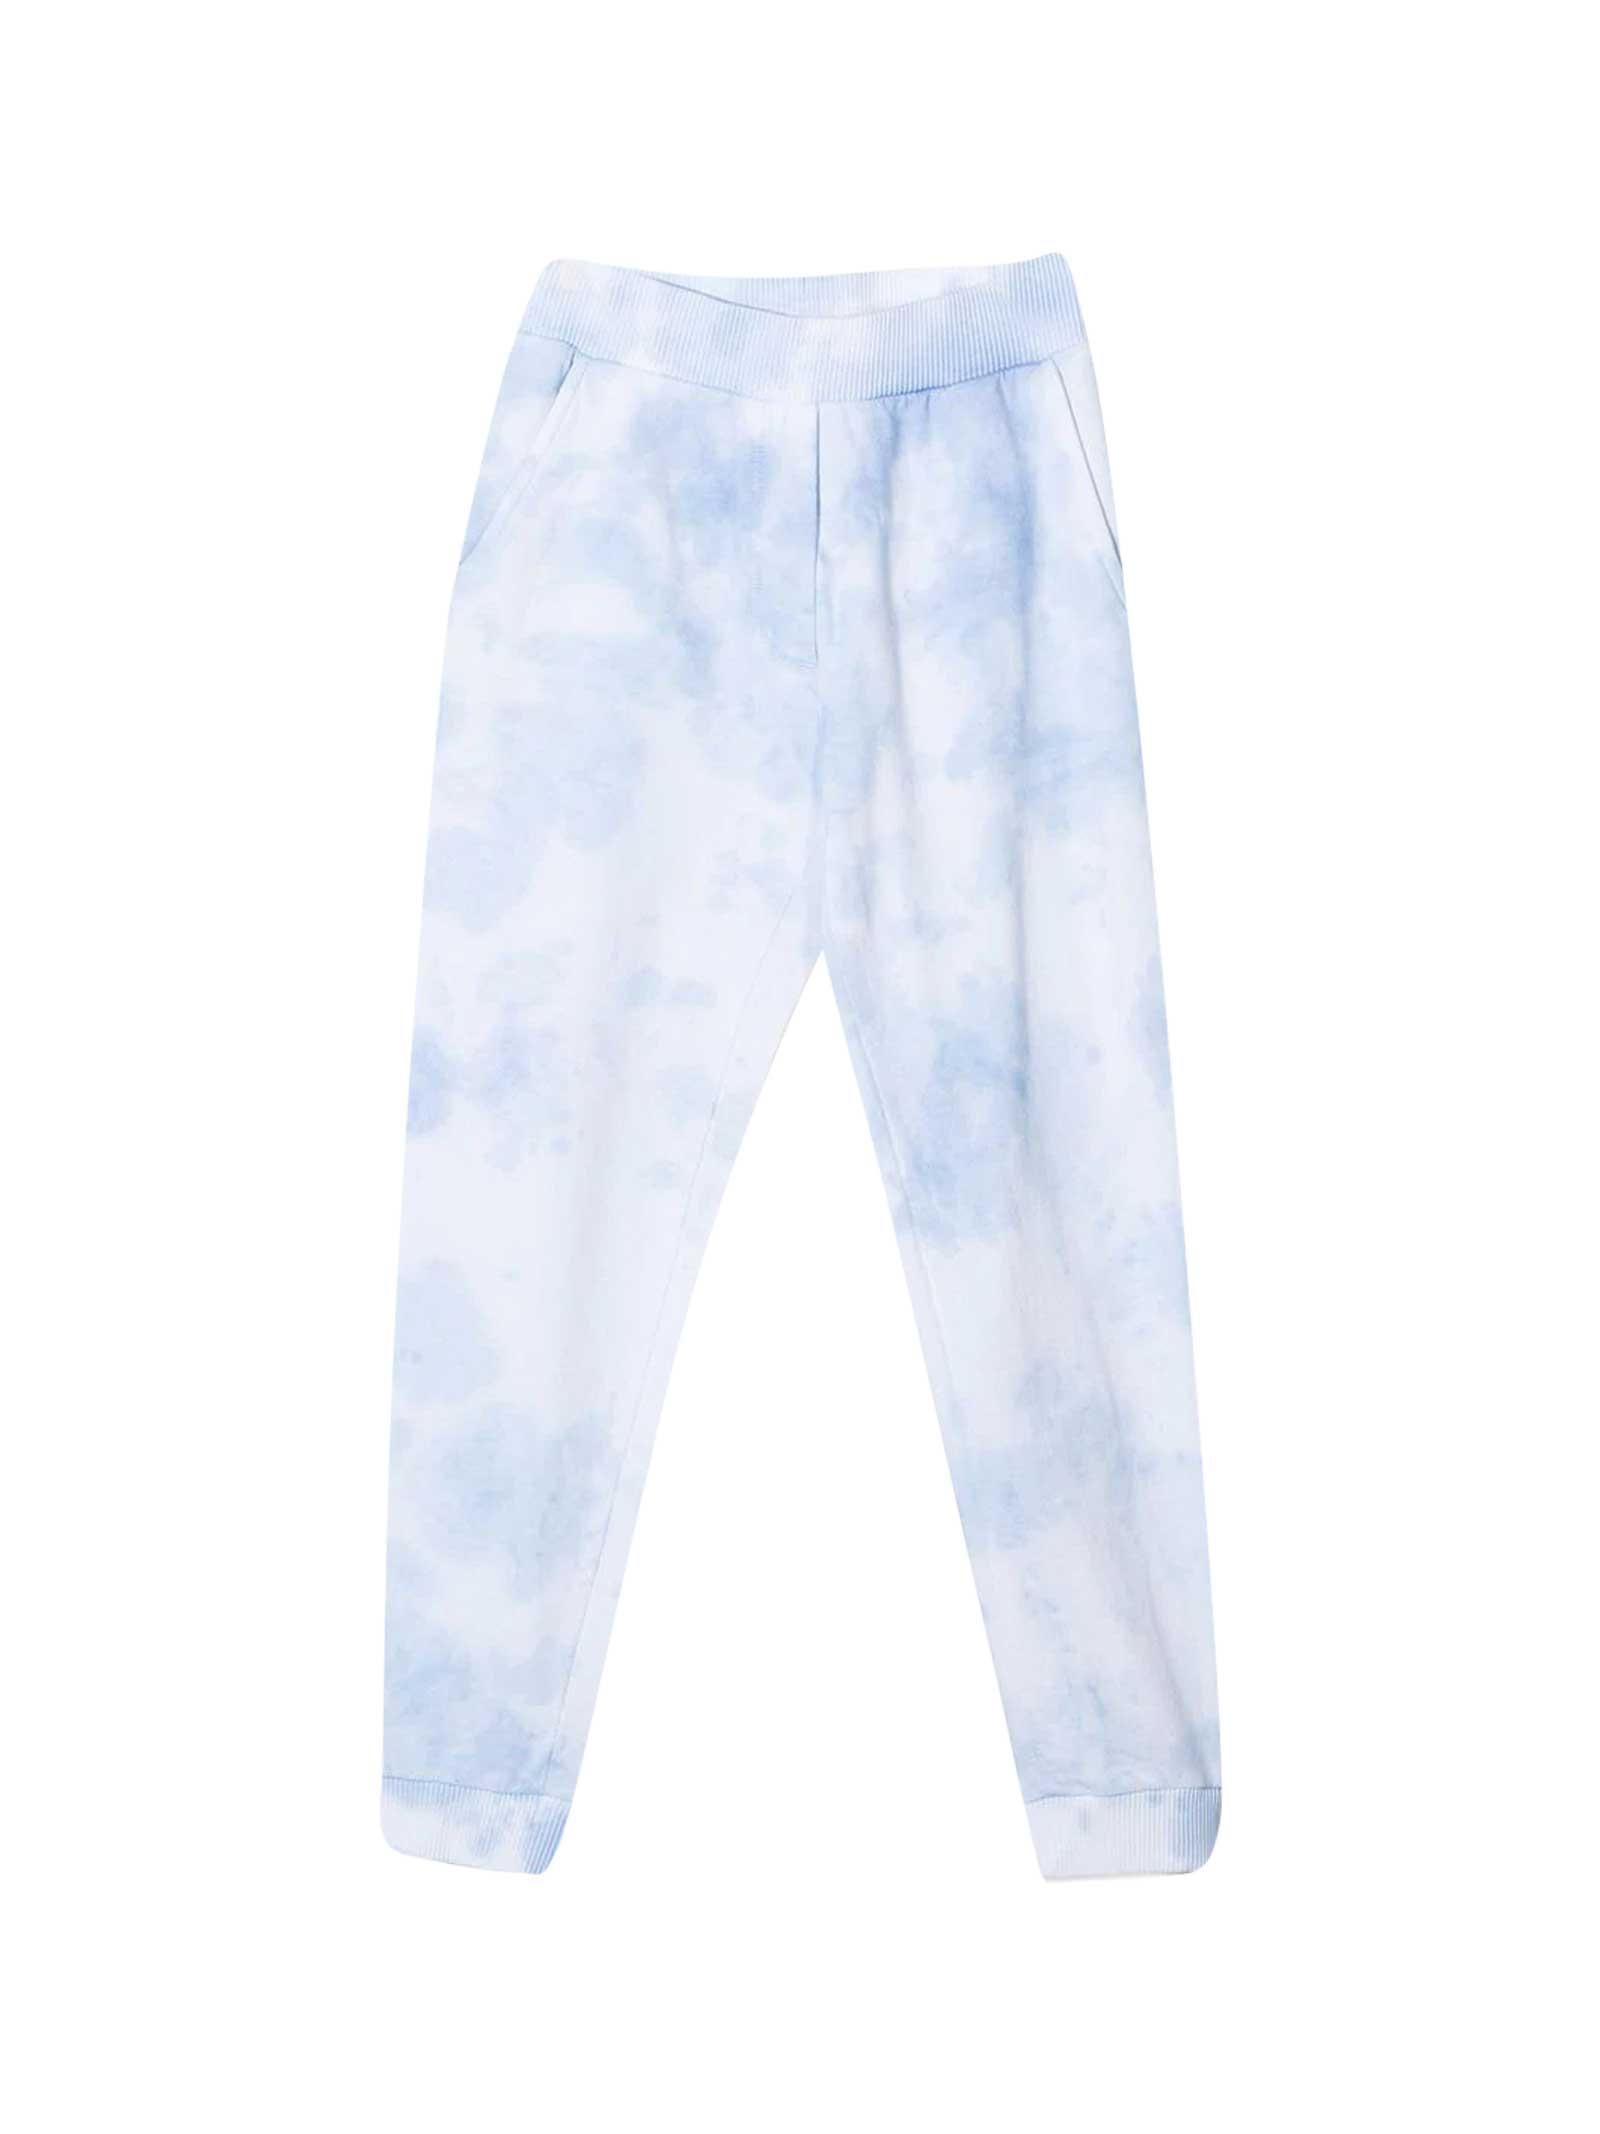 Sporty Trousers With Tie Dye Pattern